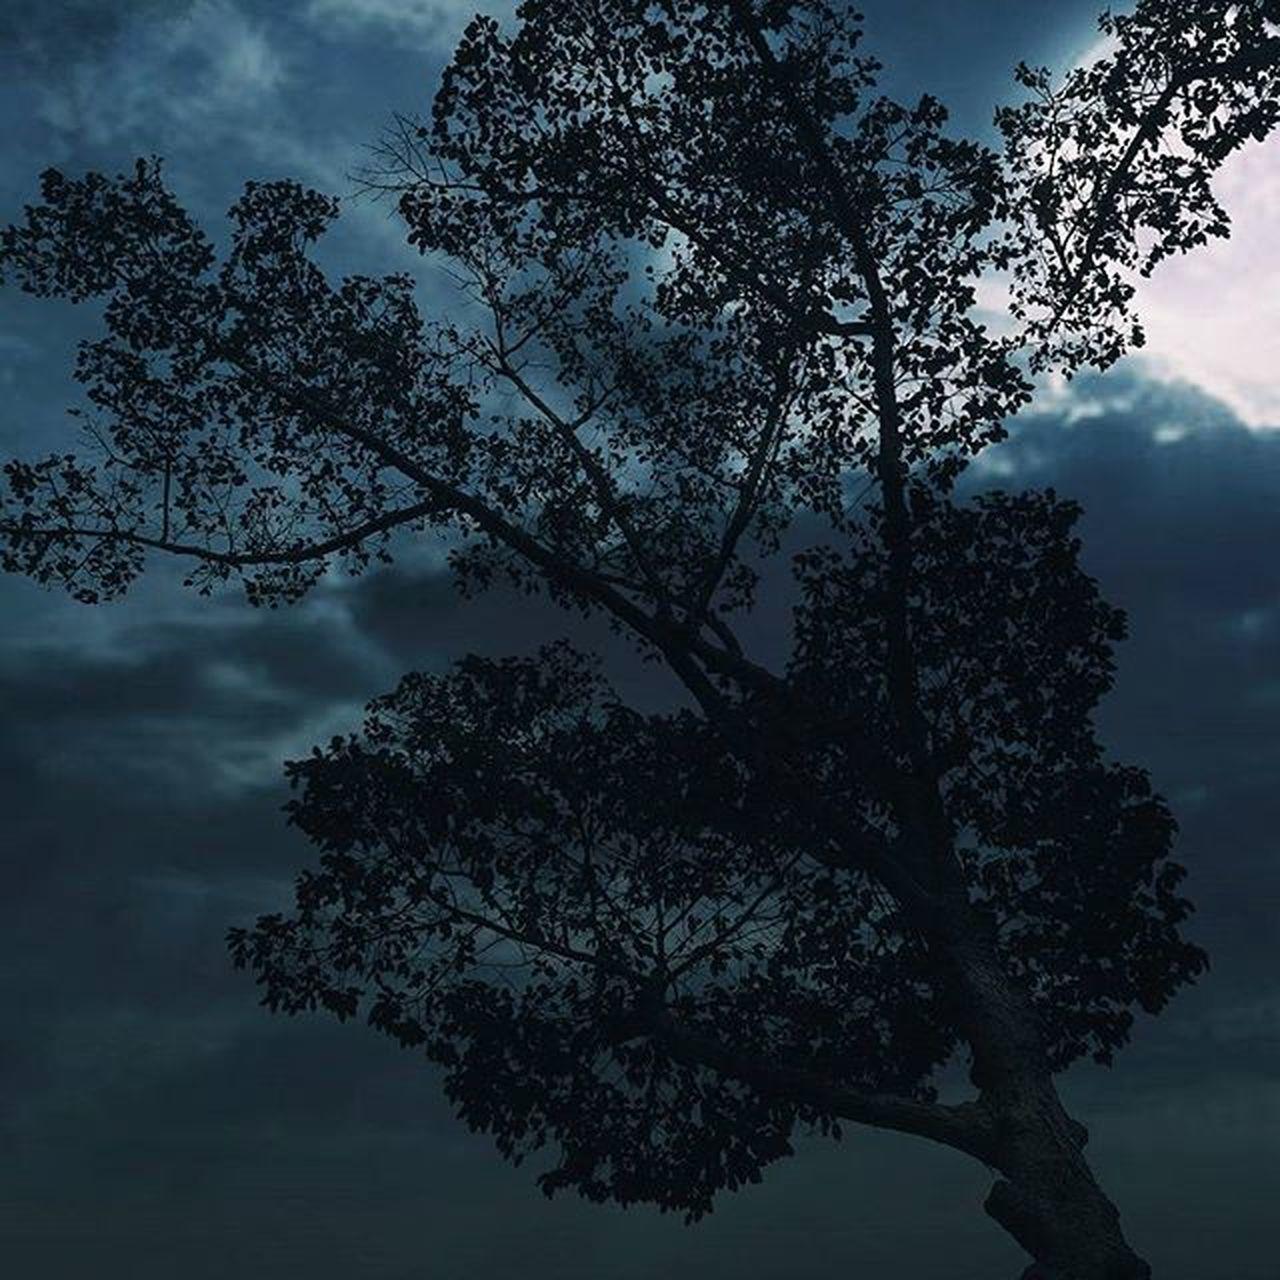 moonlight . . . . Sky CreateExplore Explore Night INDONESIA Photodirect Moodygram Moodygrams Beautyful